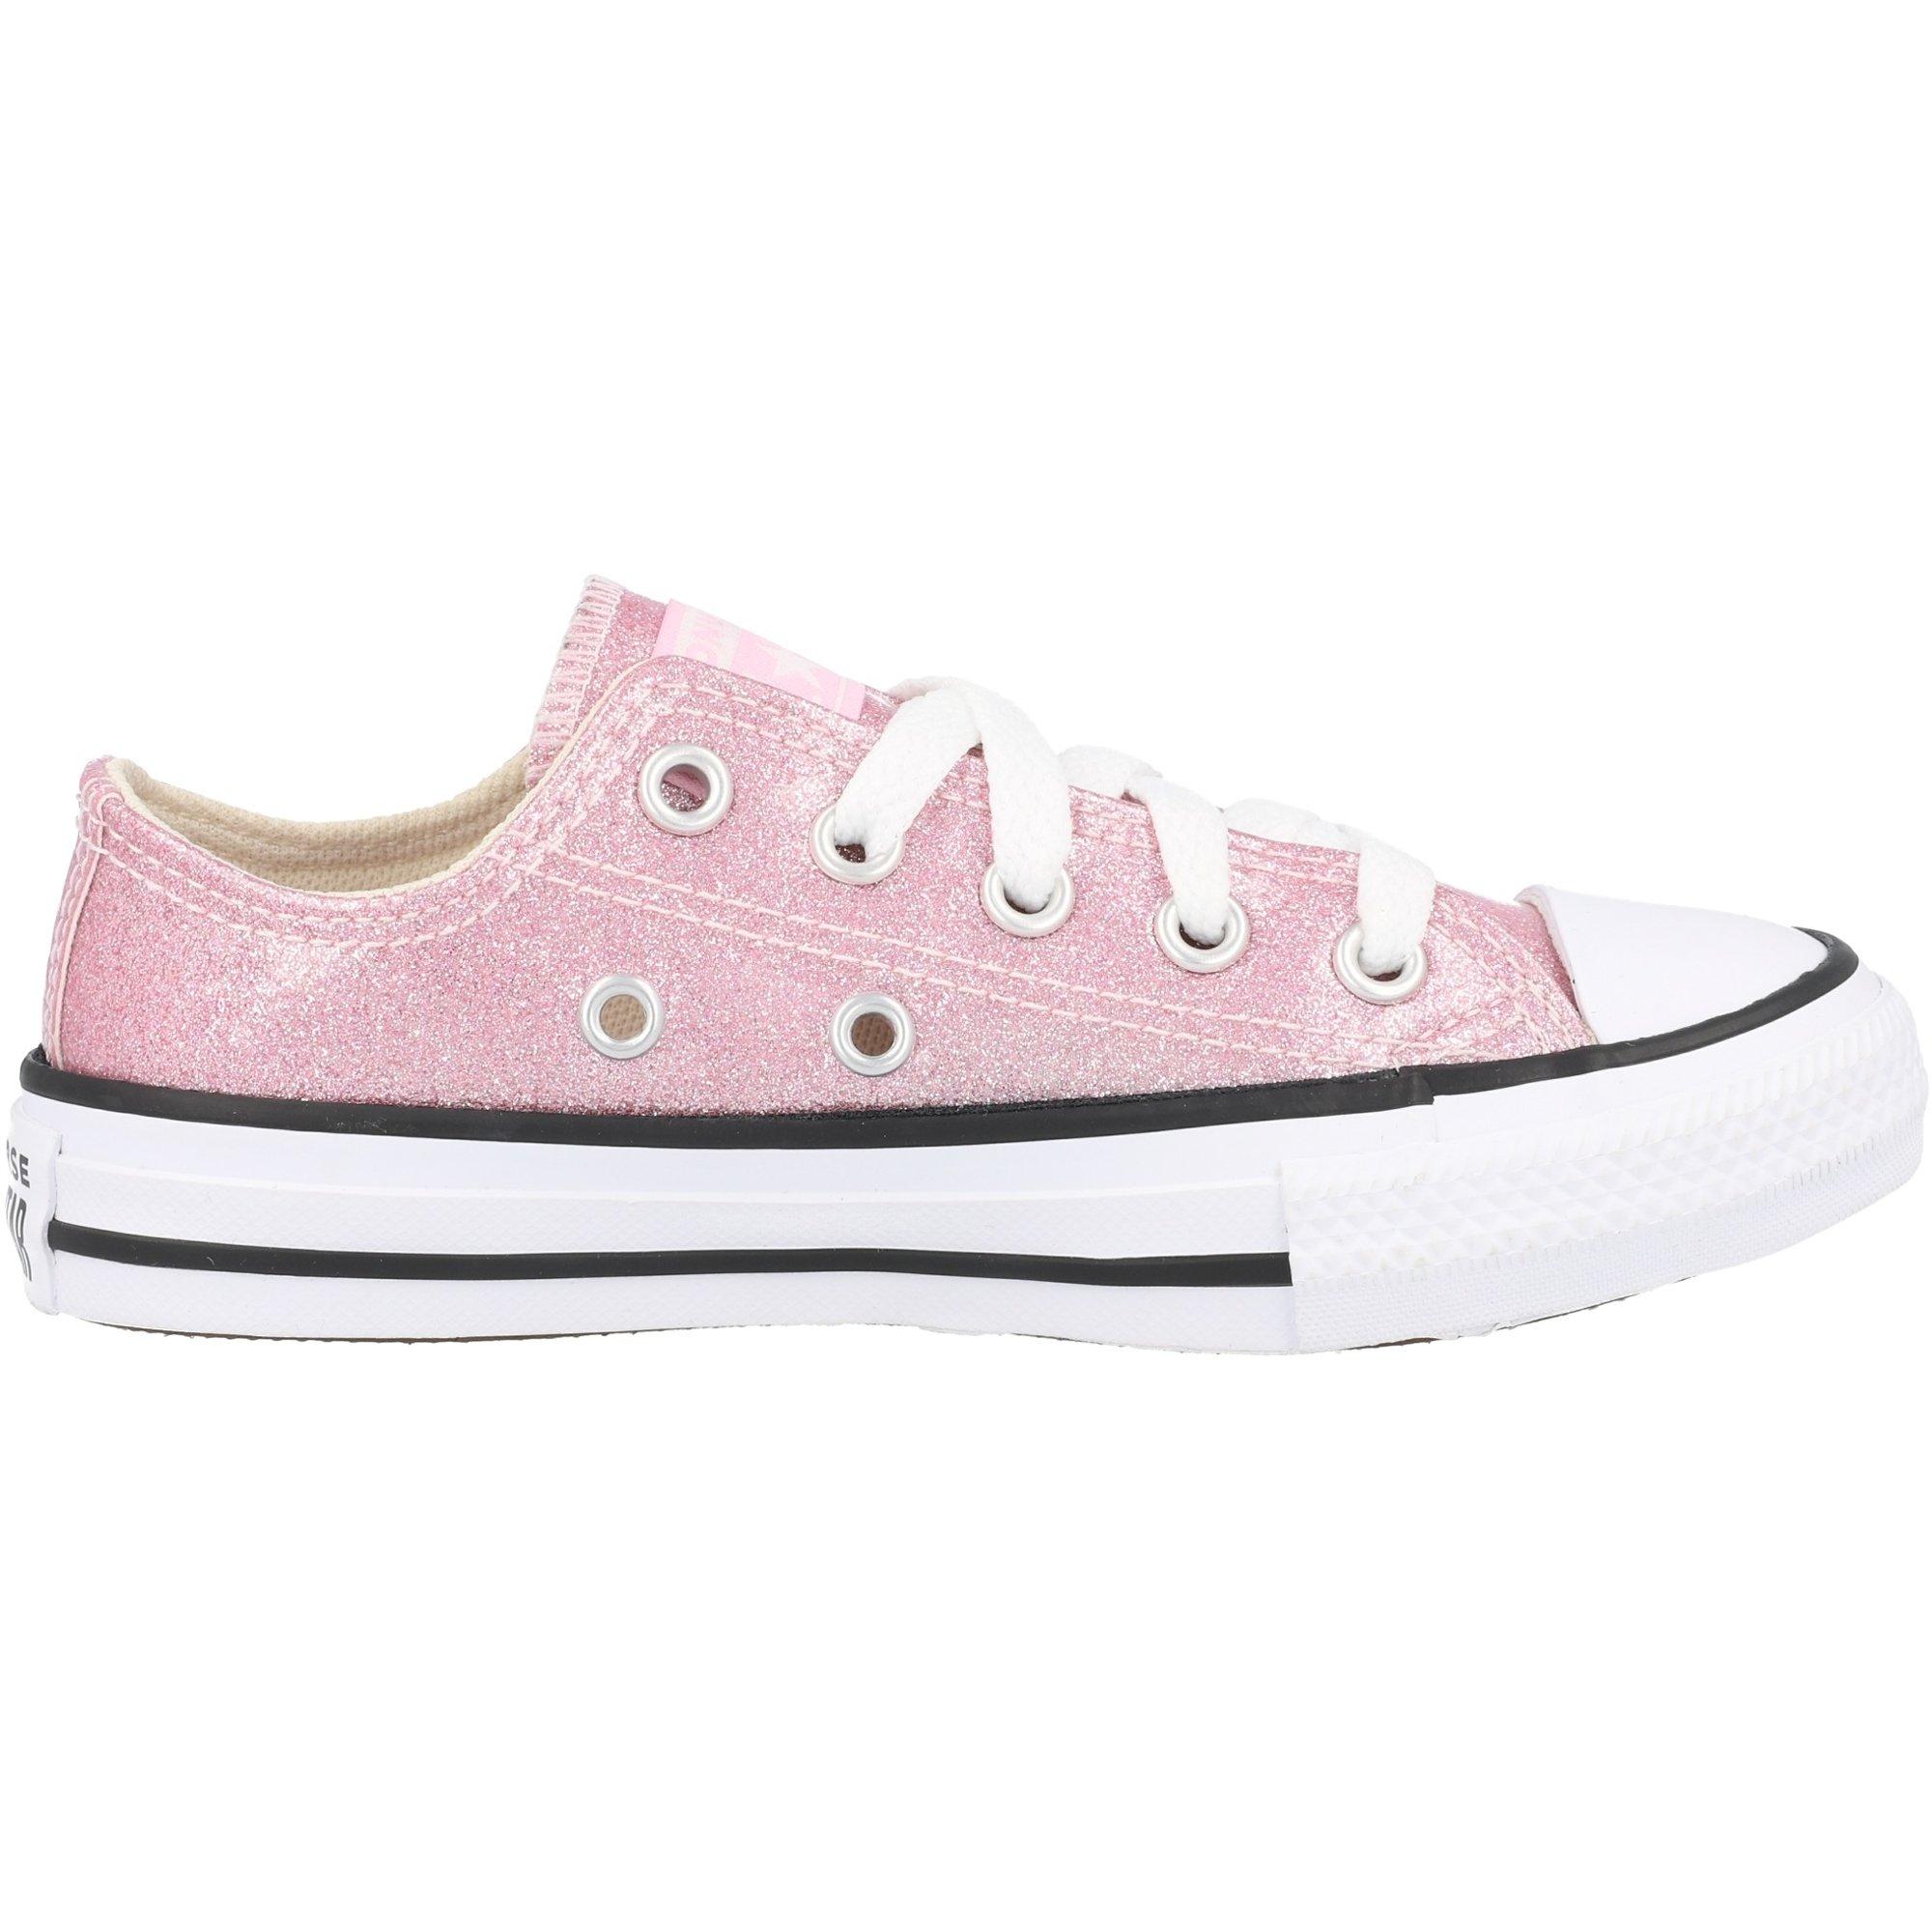 Converse Chuck Taylor All Star Ox Pink Glaze/Black Coated Glitter